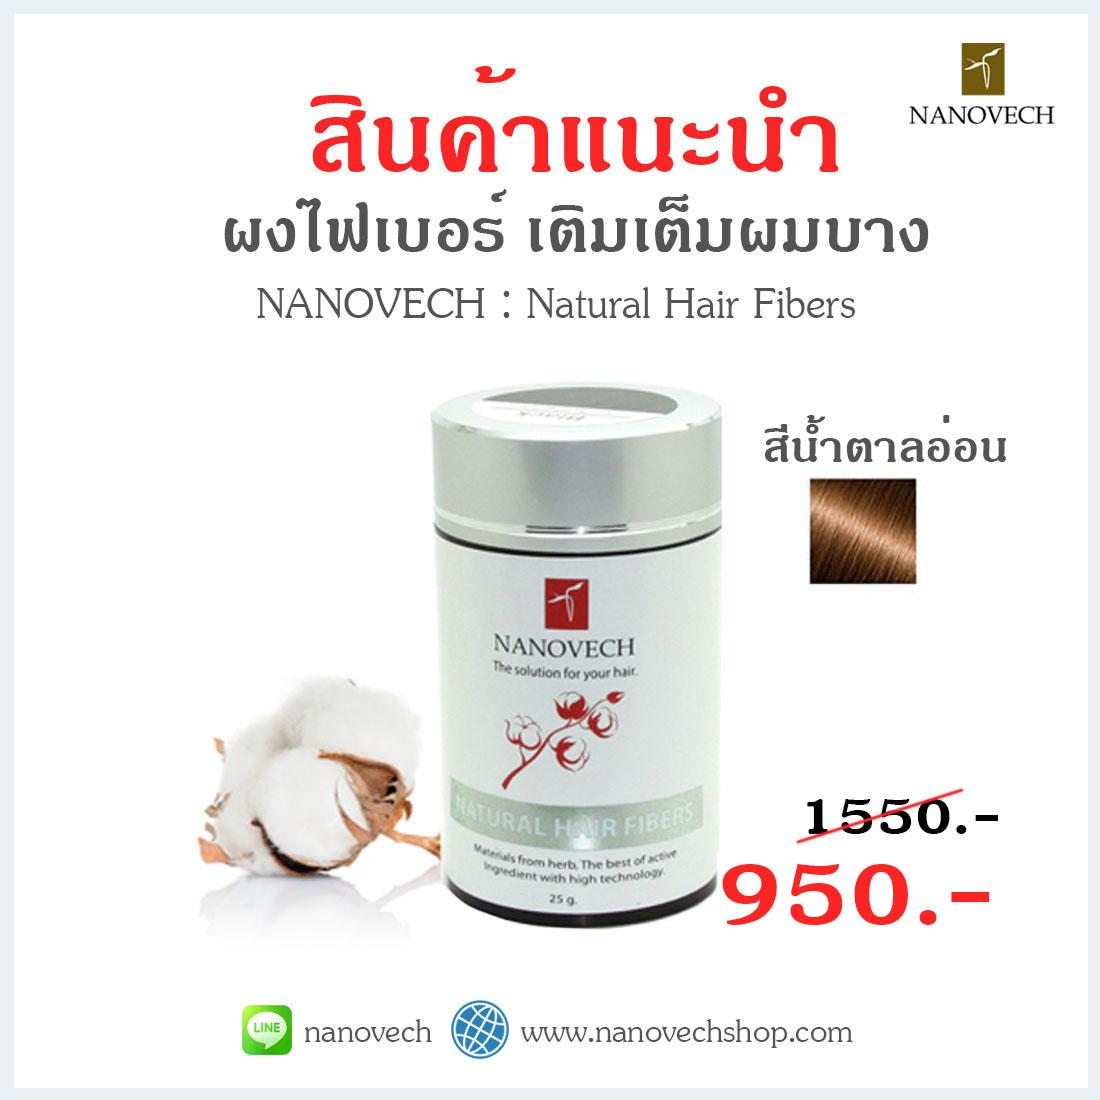 Nanovech : Natural Hair Fibers (สีน้ำตาลอ่อน)